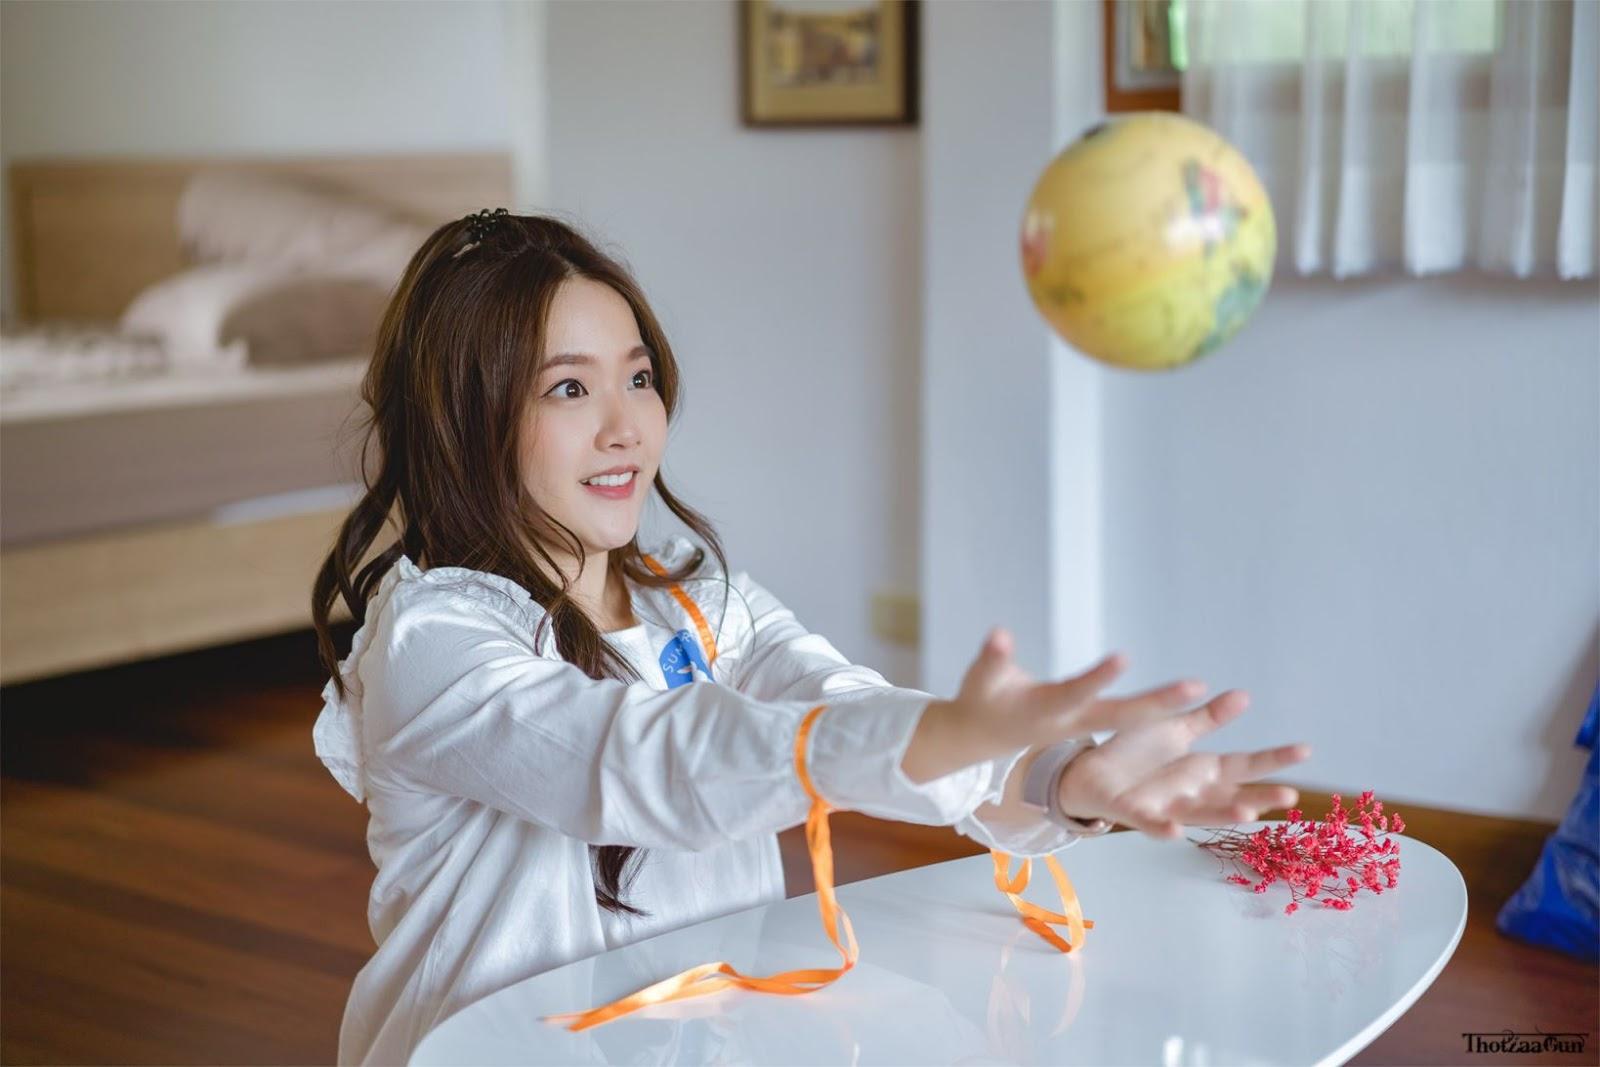 Cutest Thailand model - Kamonravee Korsampan (Aueyauey เอ๋ยเอ้ย) - Home alone - TruePic.net